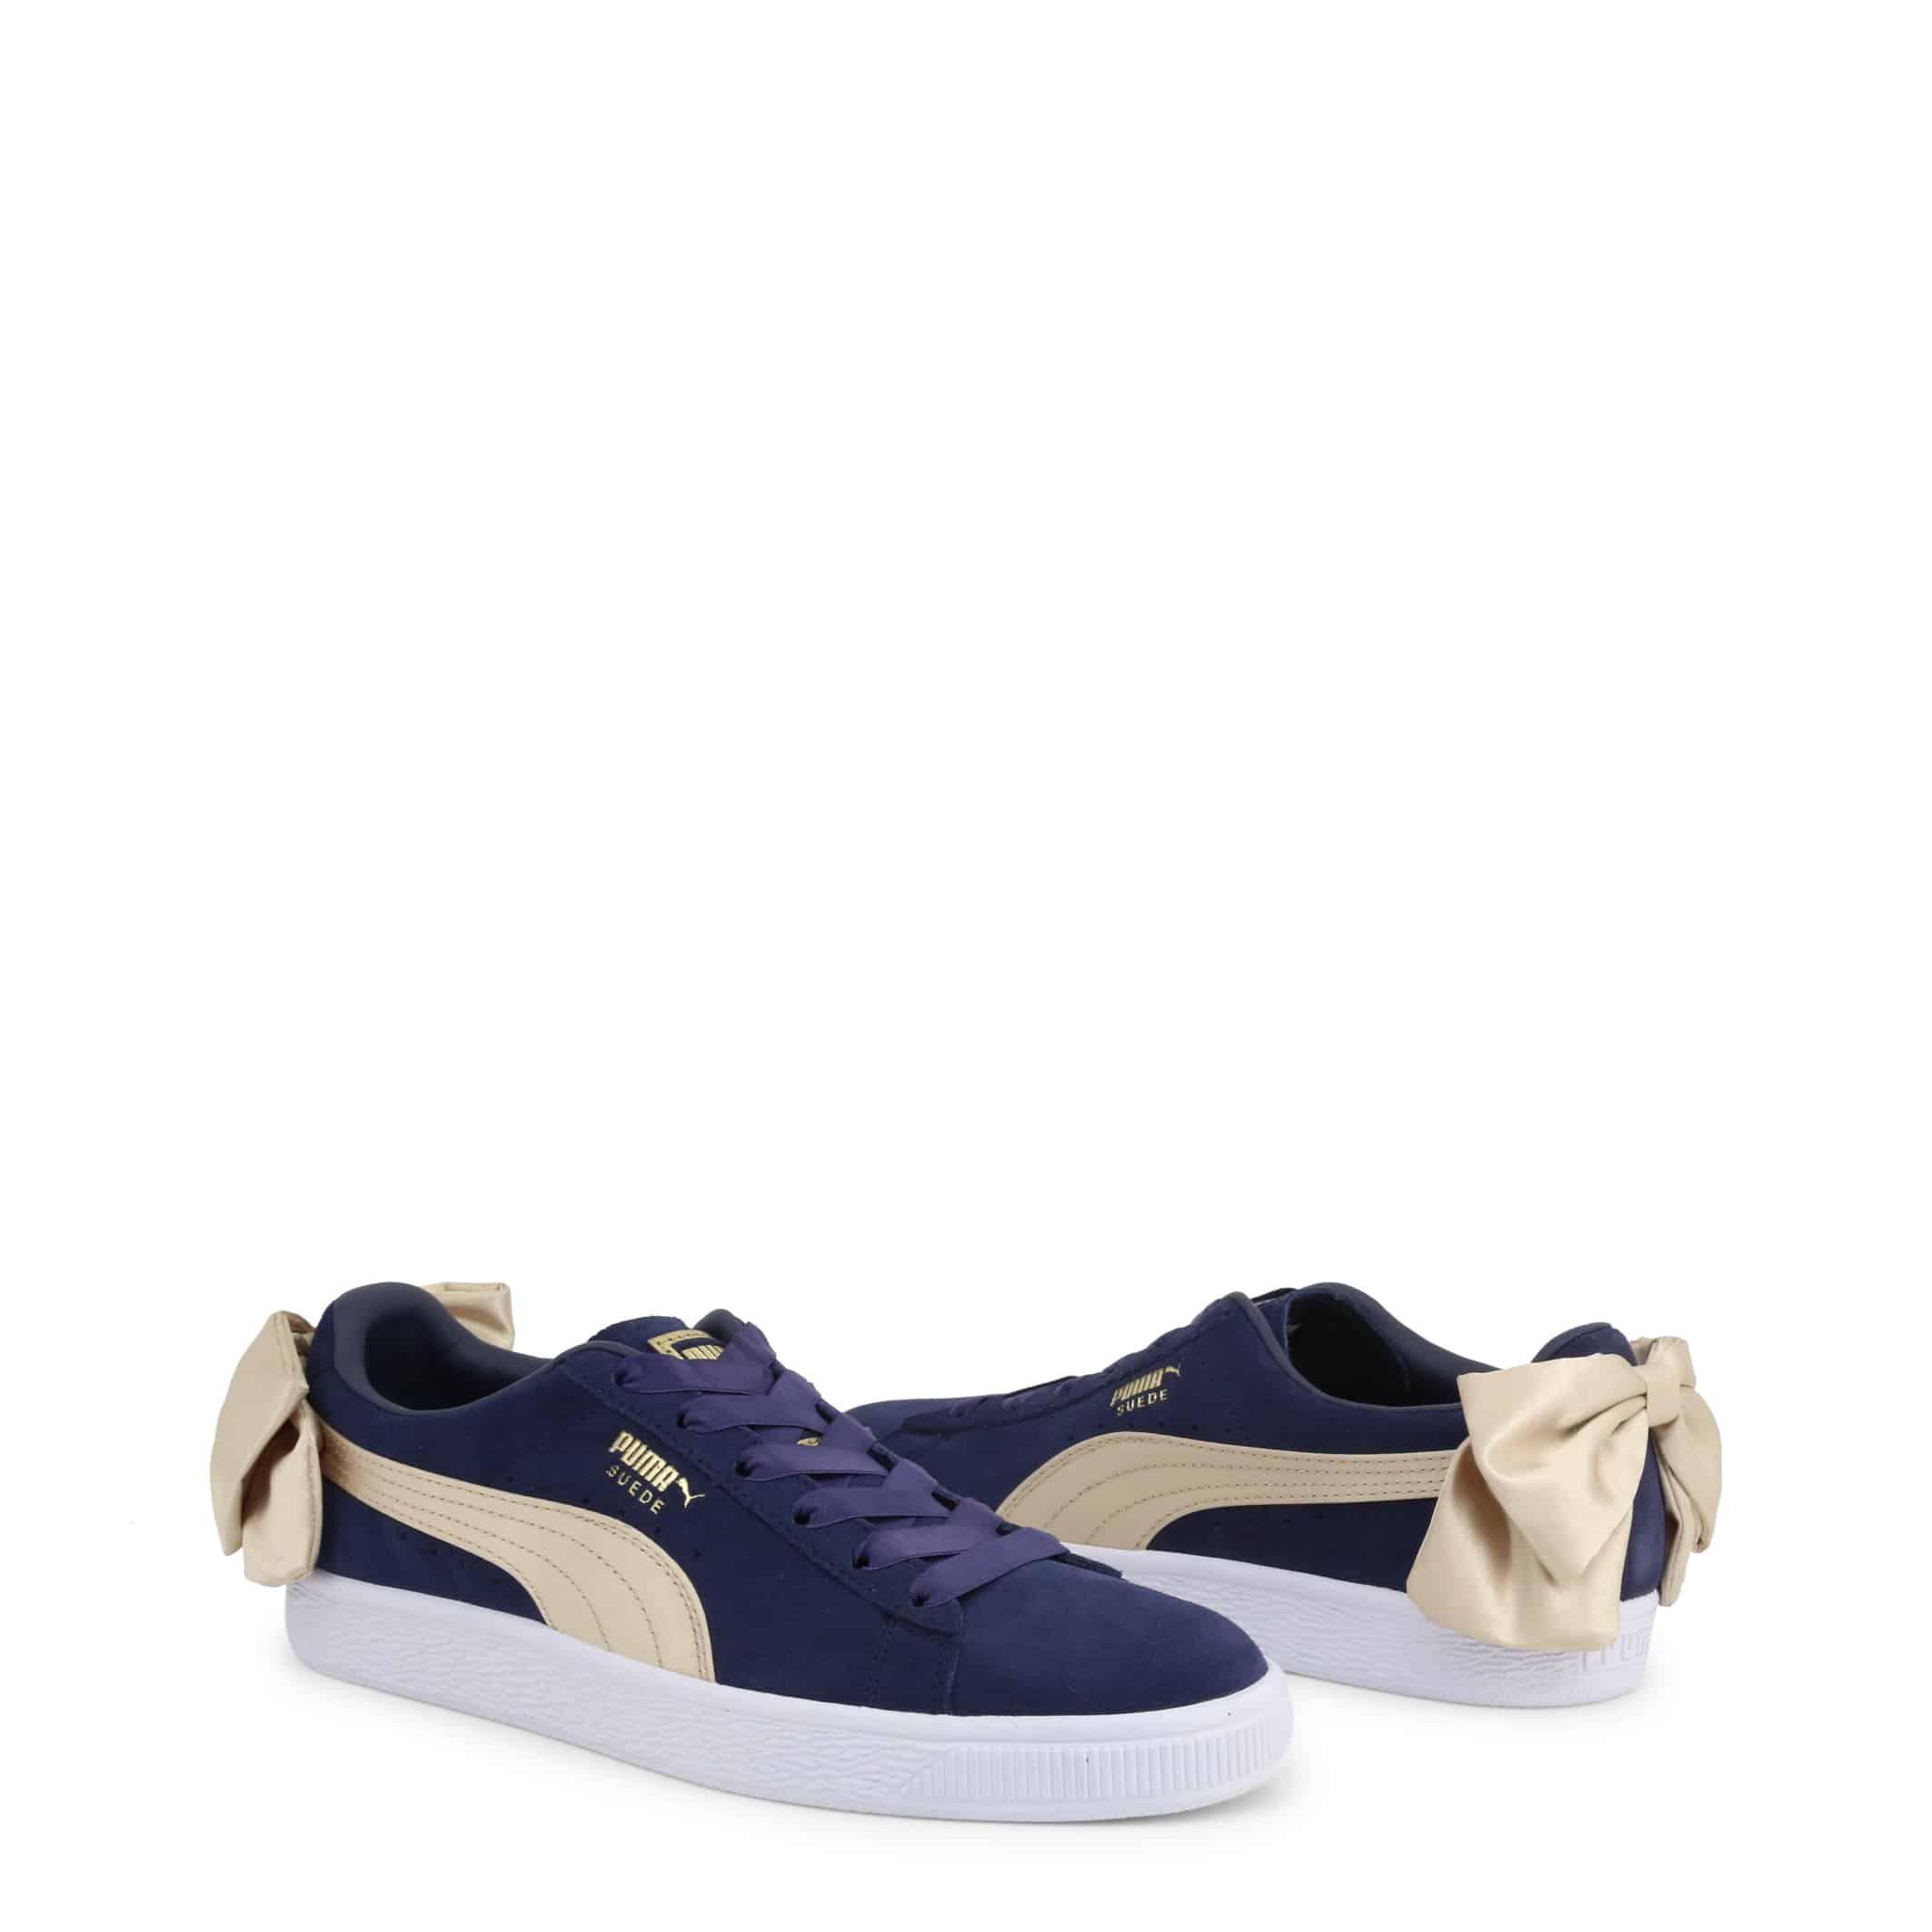 Puma  | You Fashion Outlet